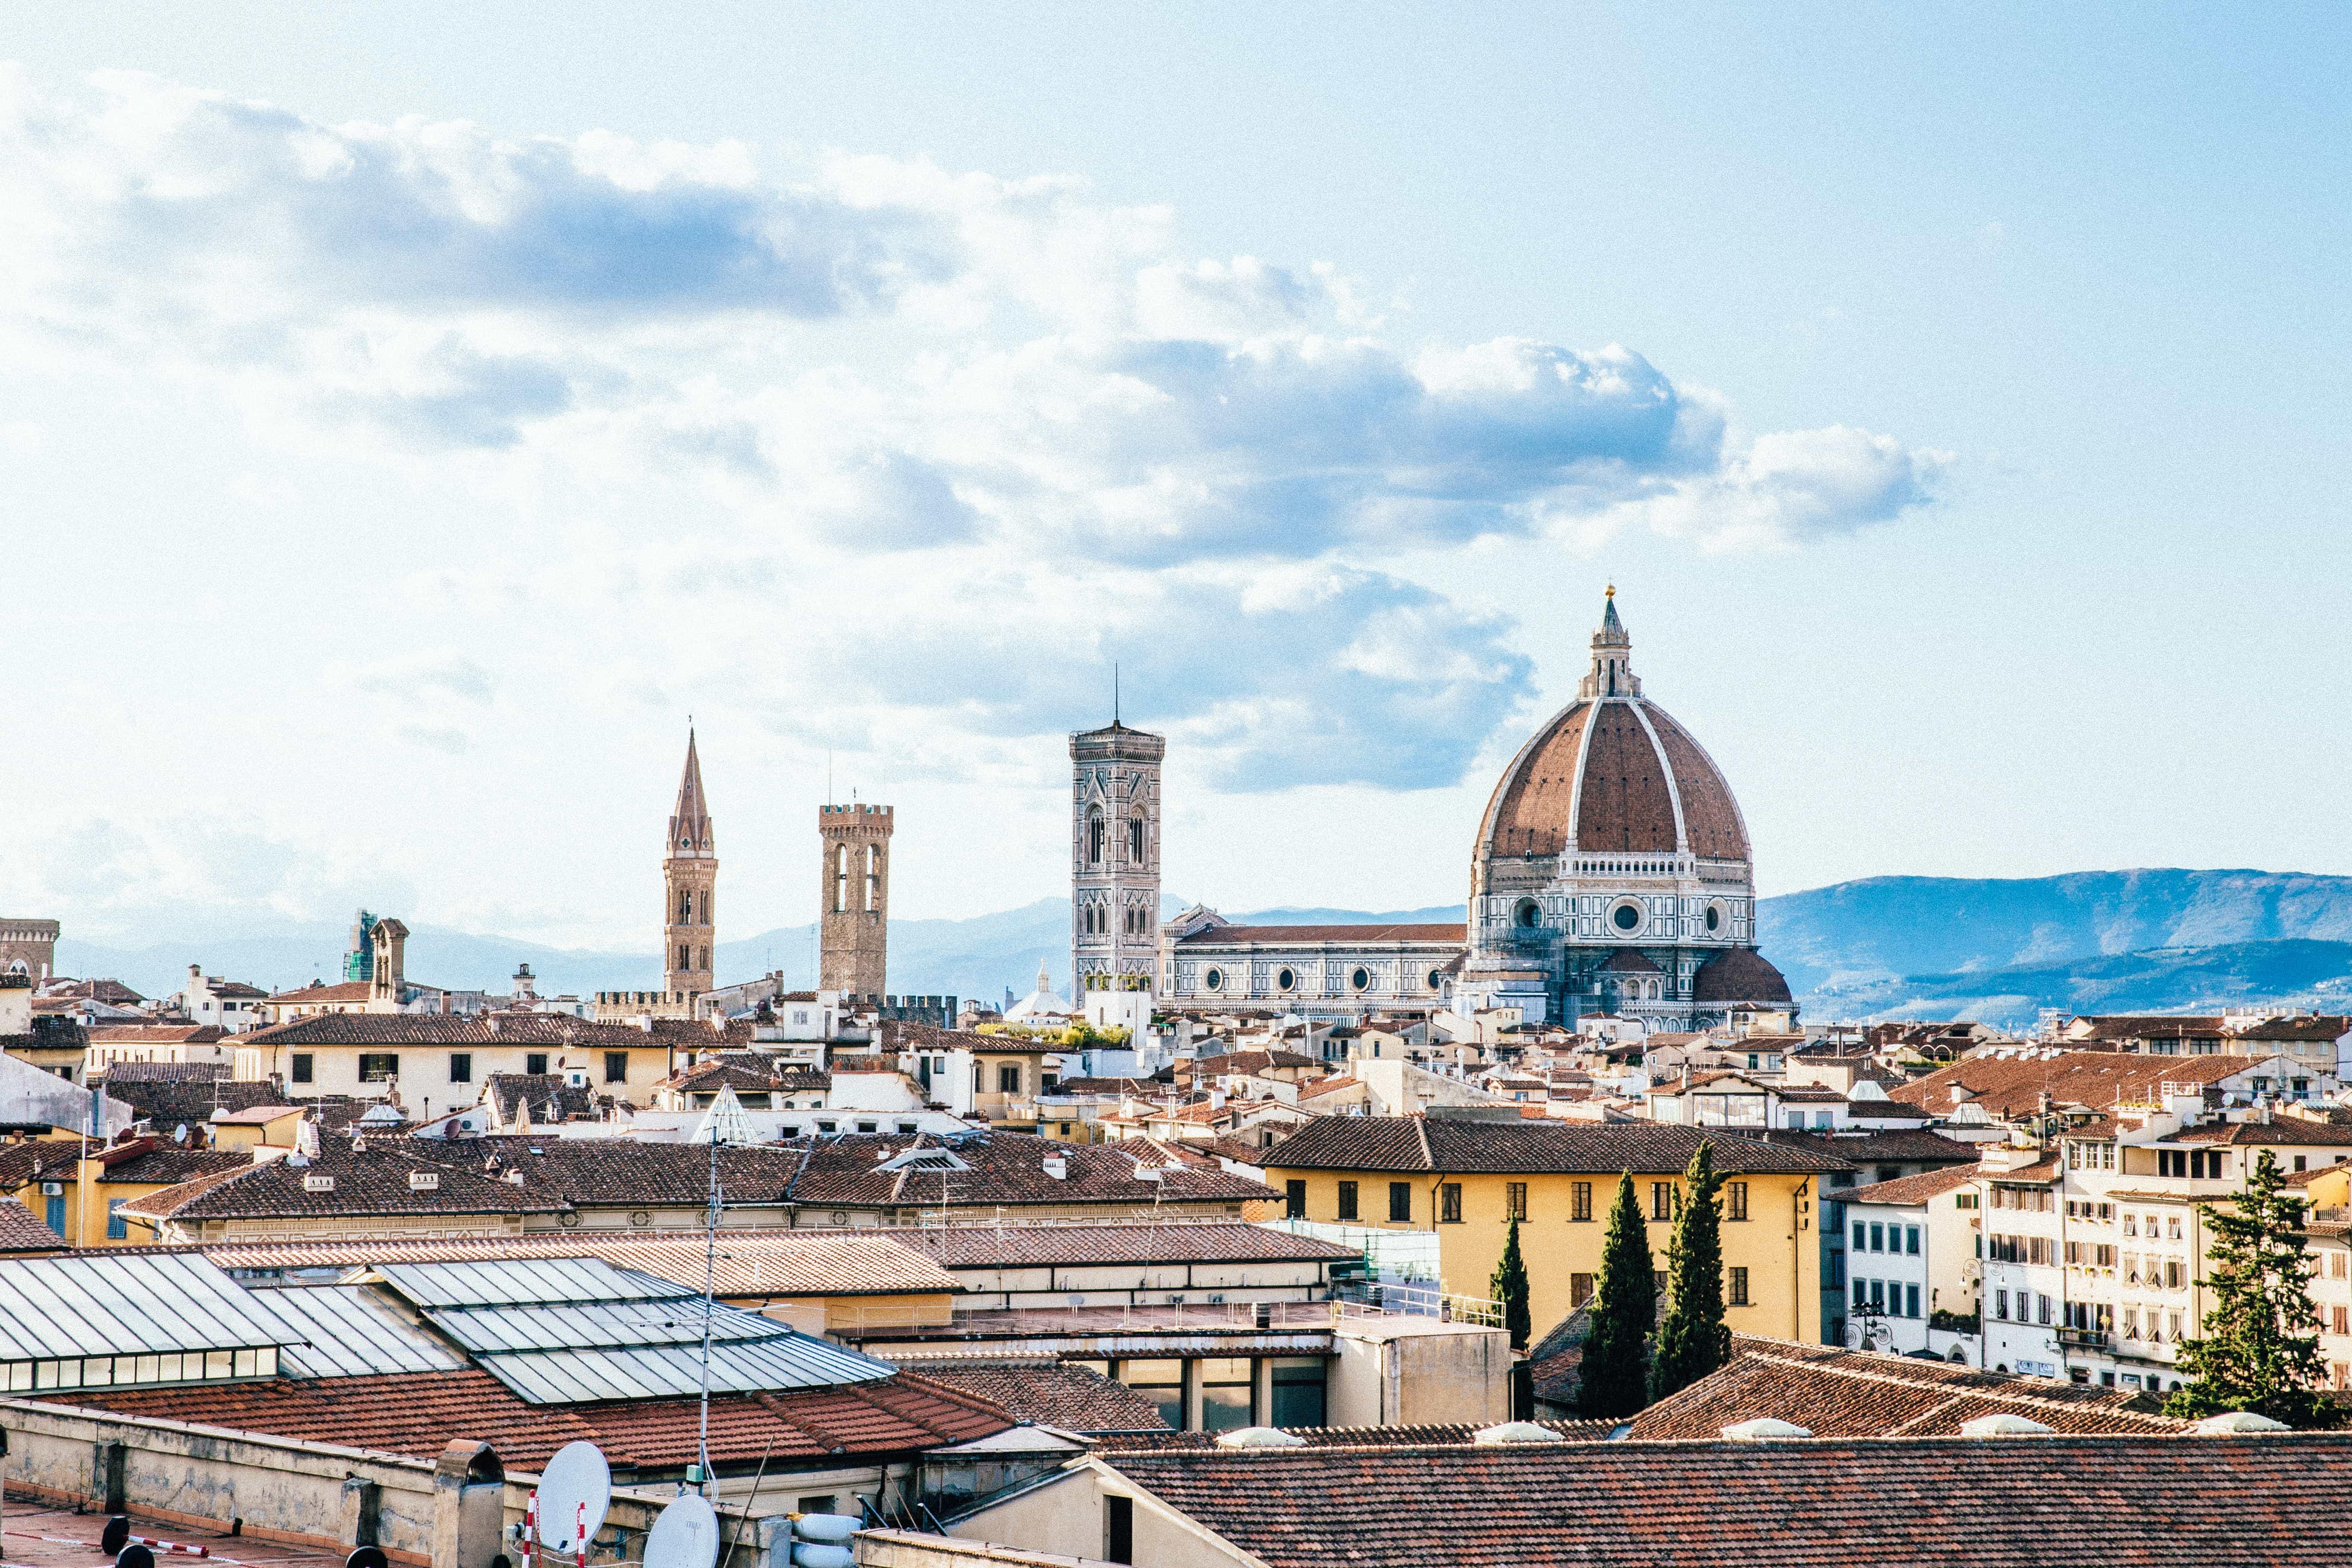 Daniel Sammut - Florence, Italy